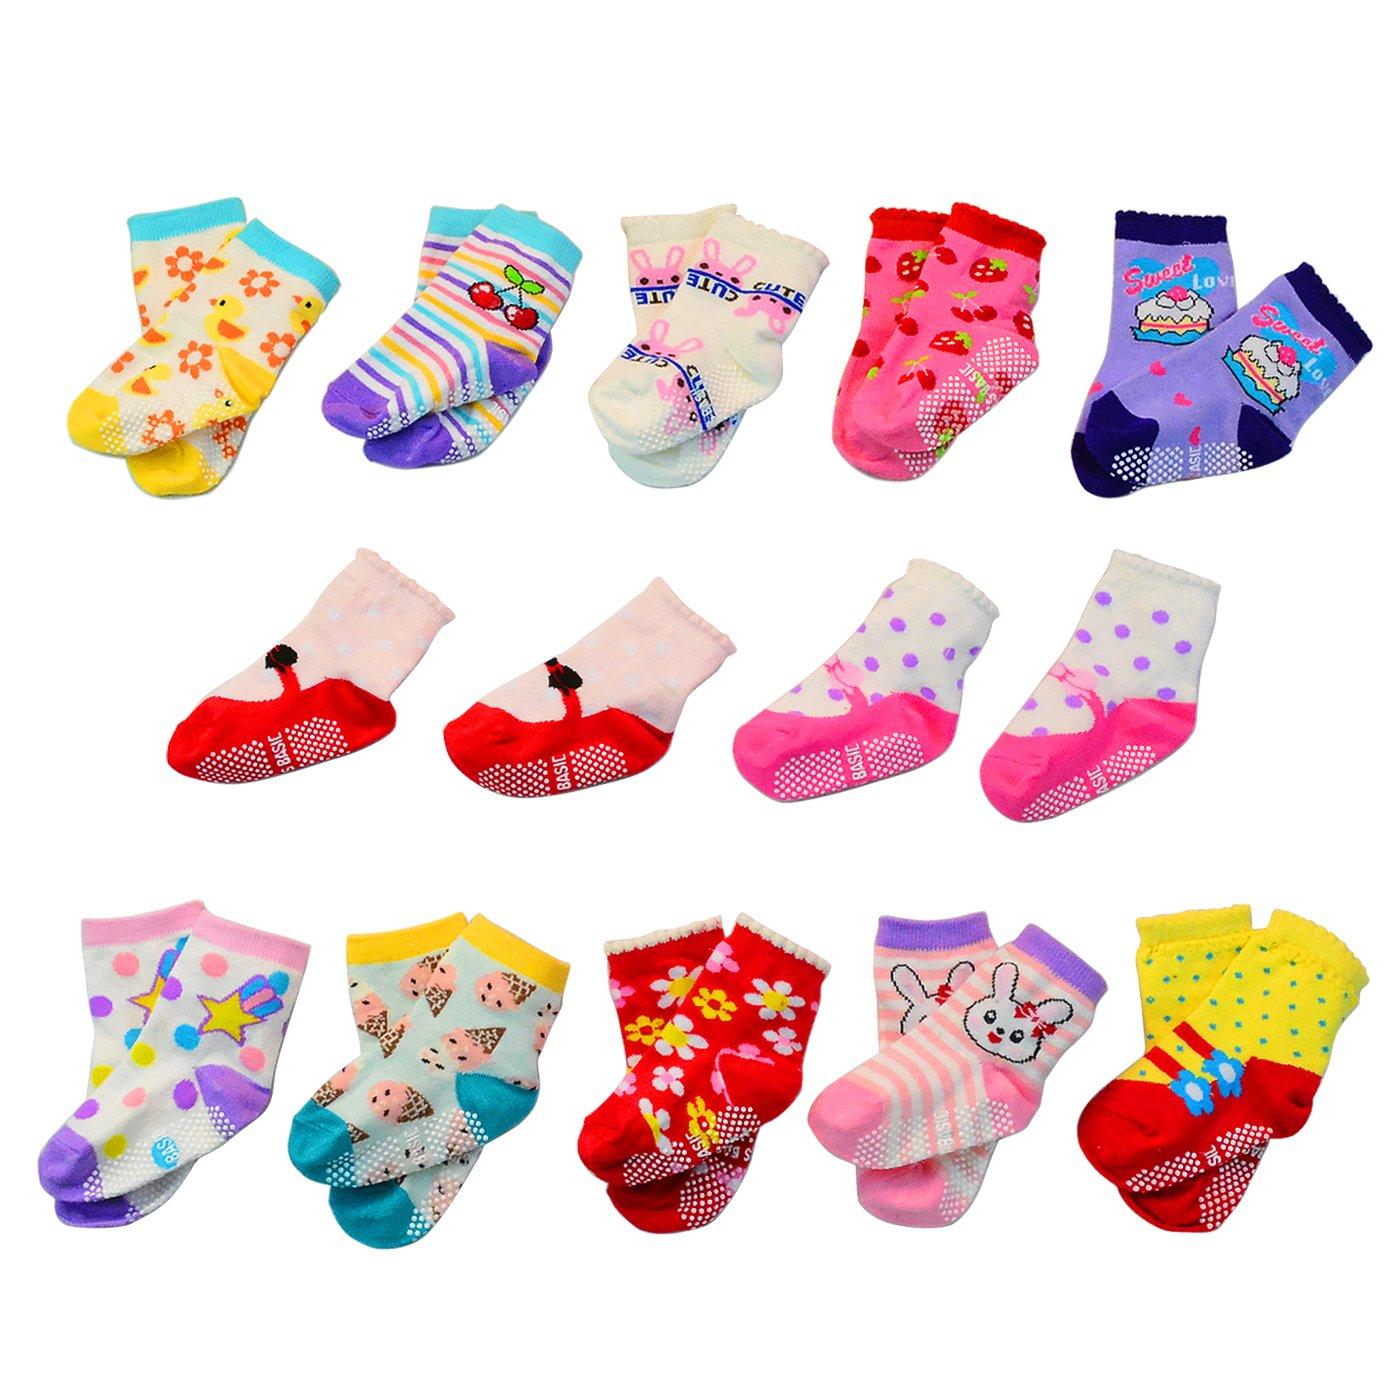 10 Pairs 12-36 Months Baby Boy Girl Cotton Socks Fun Soft Breathable Comfortable Socks Toddler Novelty Cartoon Ankle Socks